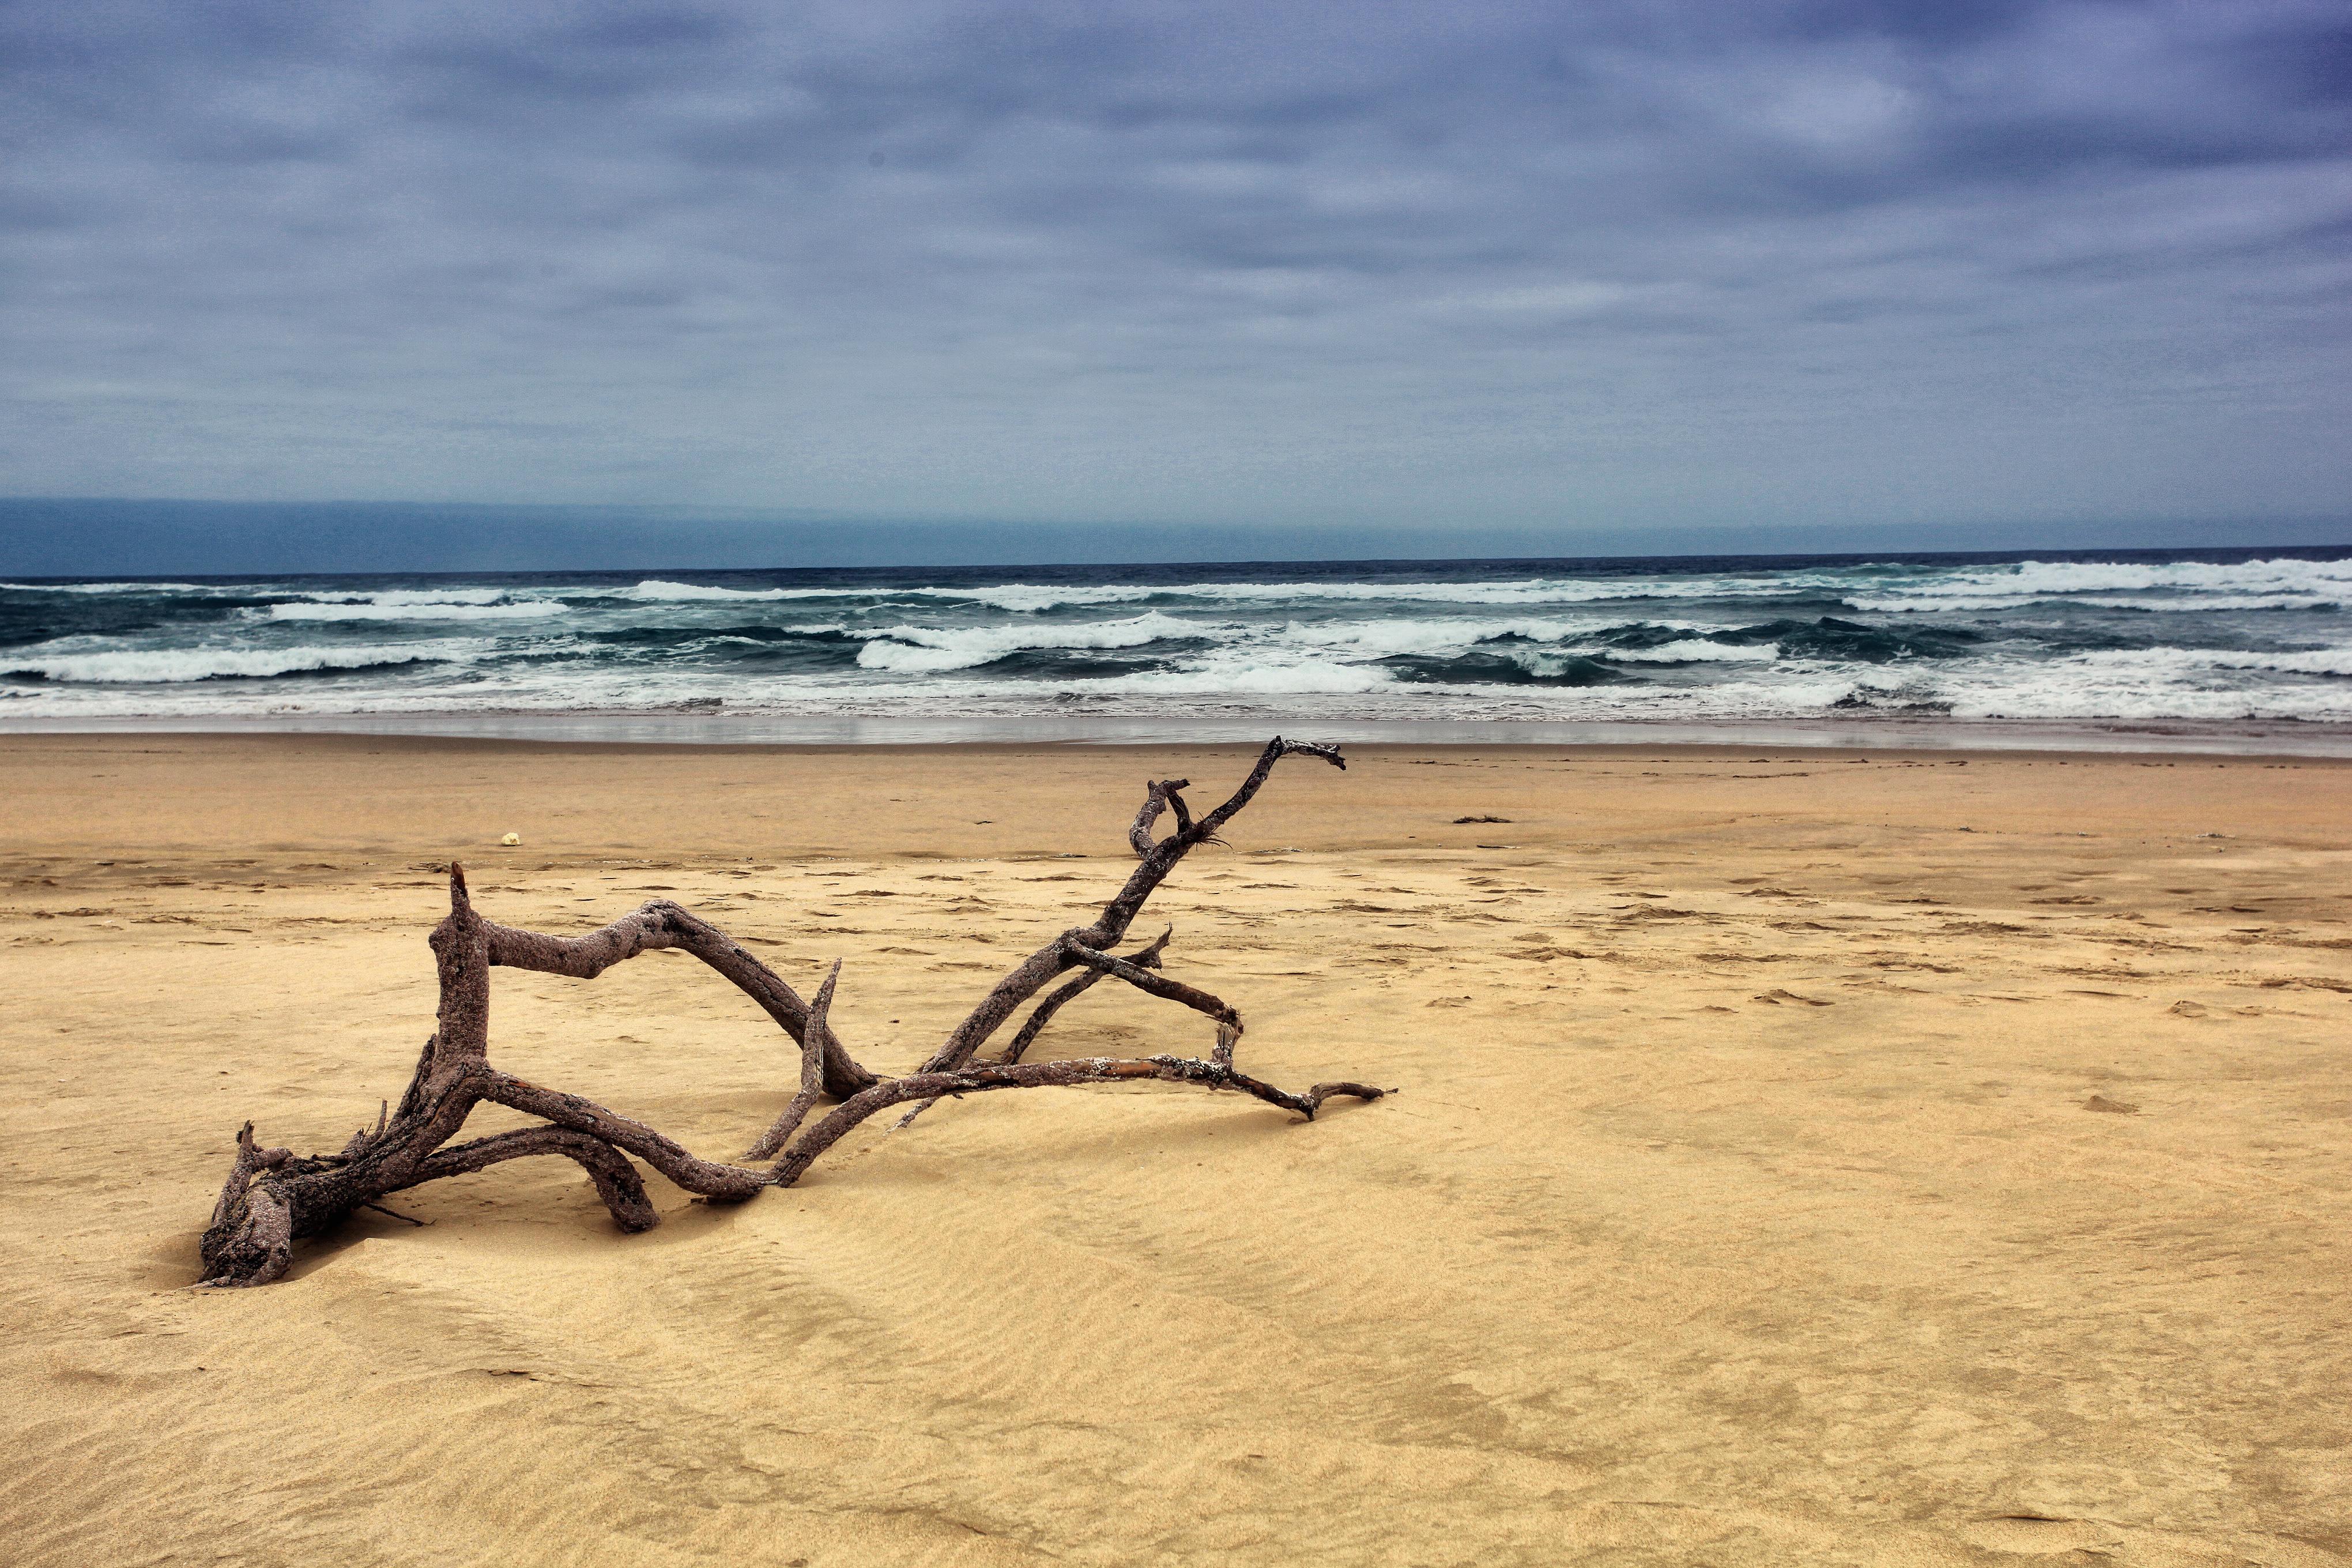 Beach 4k Ultra HD Wallpaper | Background Image | 4080x2720